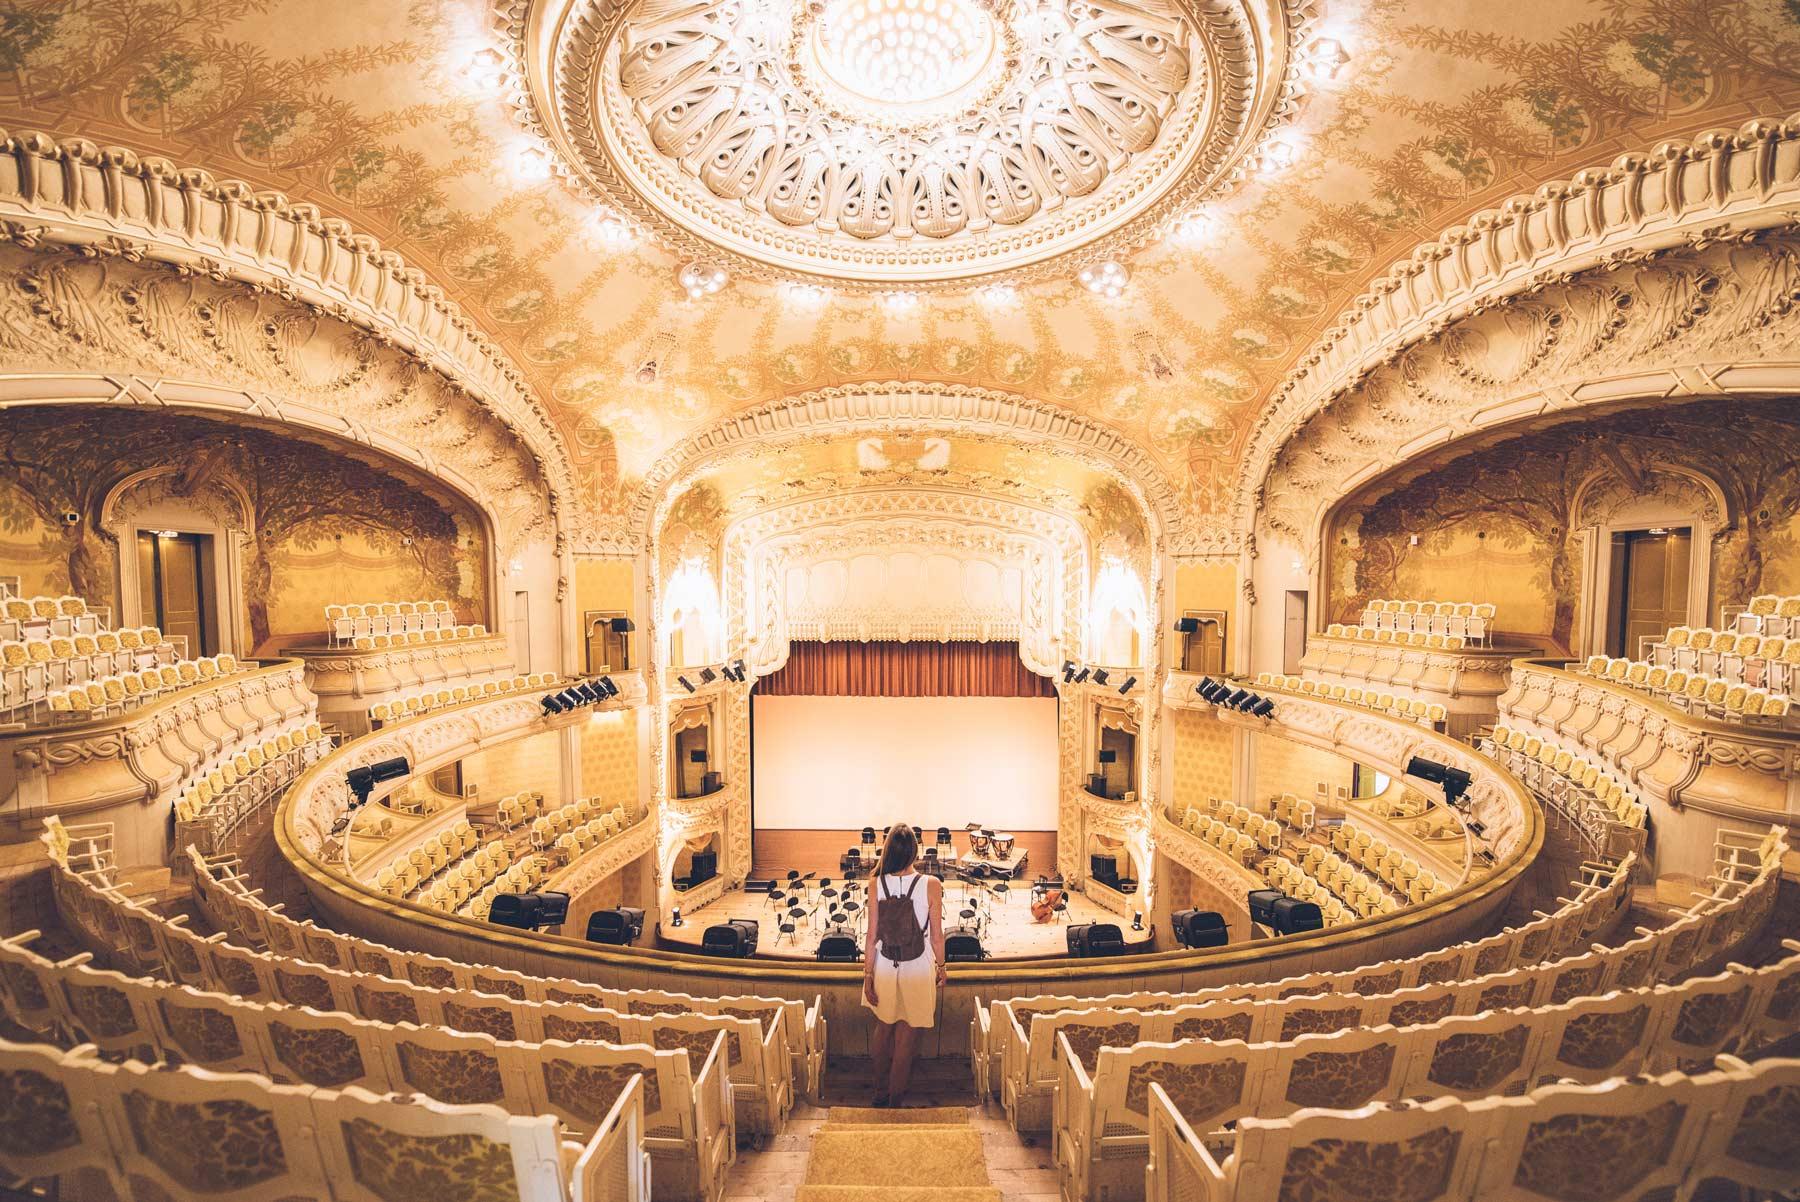 Opéra Art Nouveau, Vichy, France